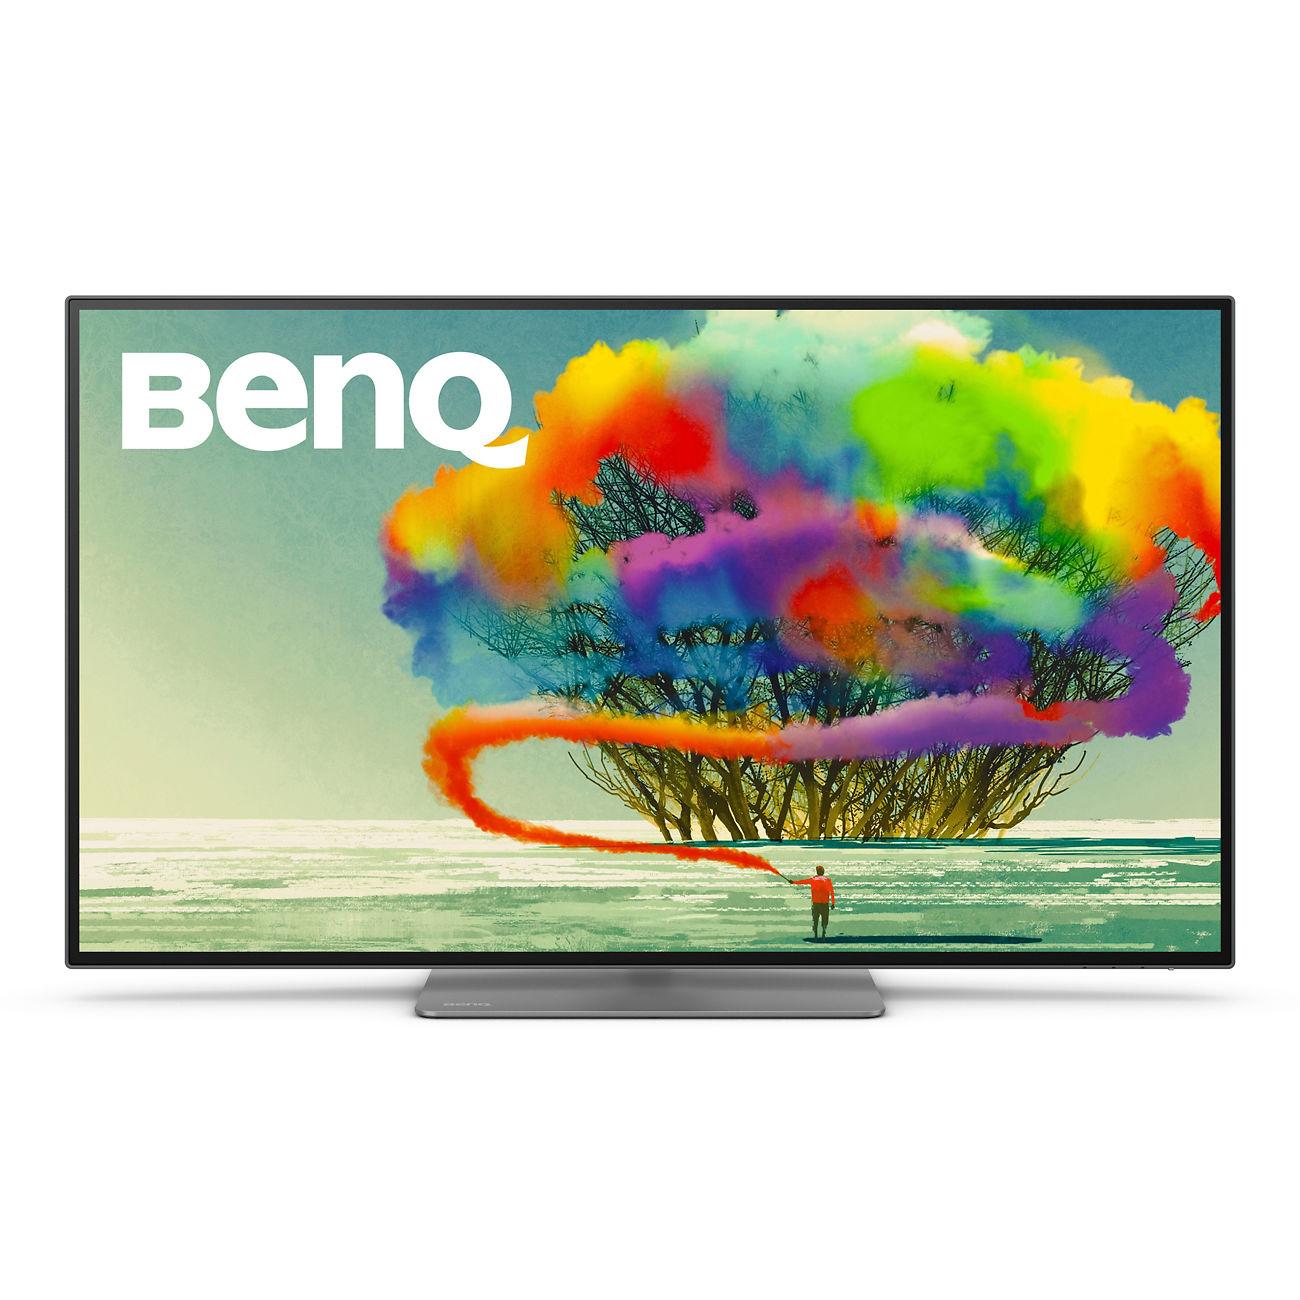 "BenQ PD3220U 31.5"" 4K Designer Monitor Image"